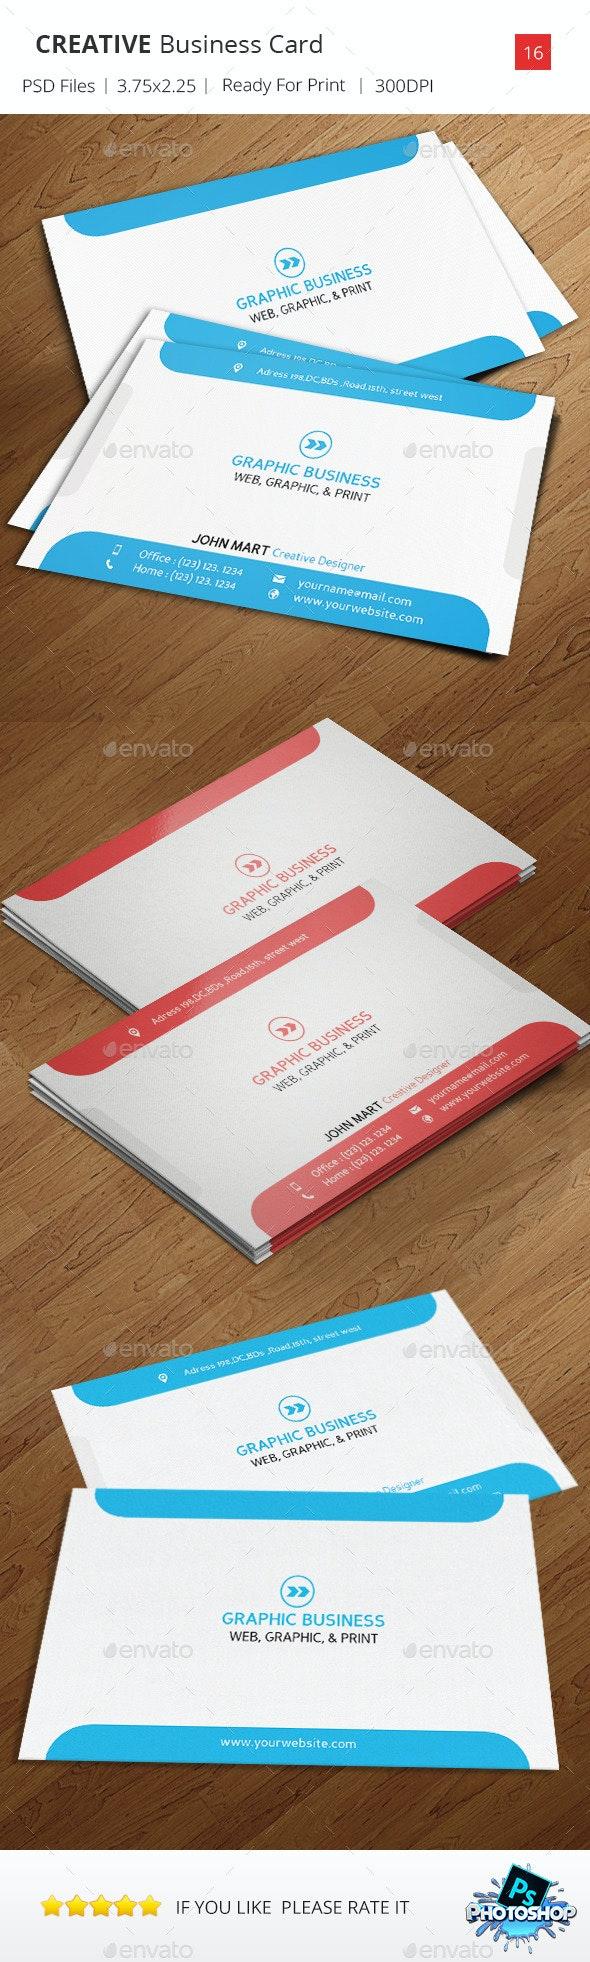 Creative Business Card v.16 - Creative Business Cards